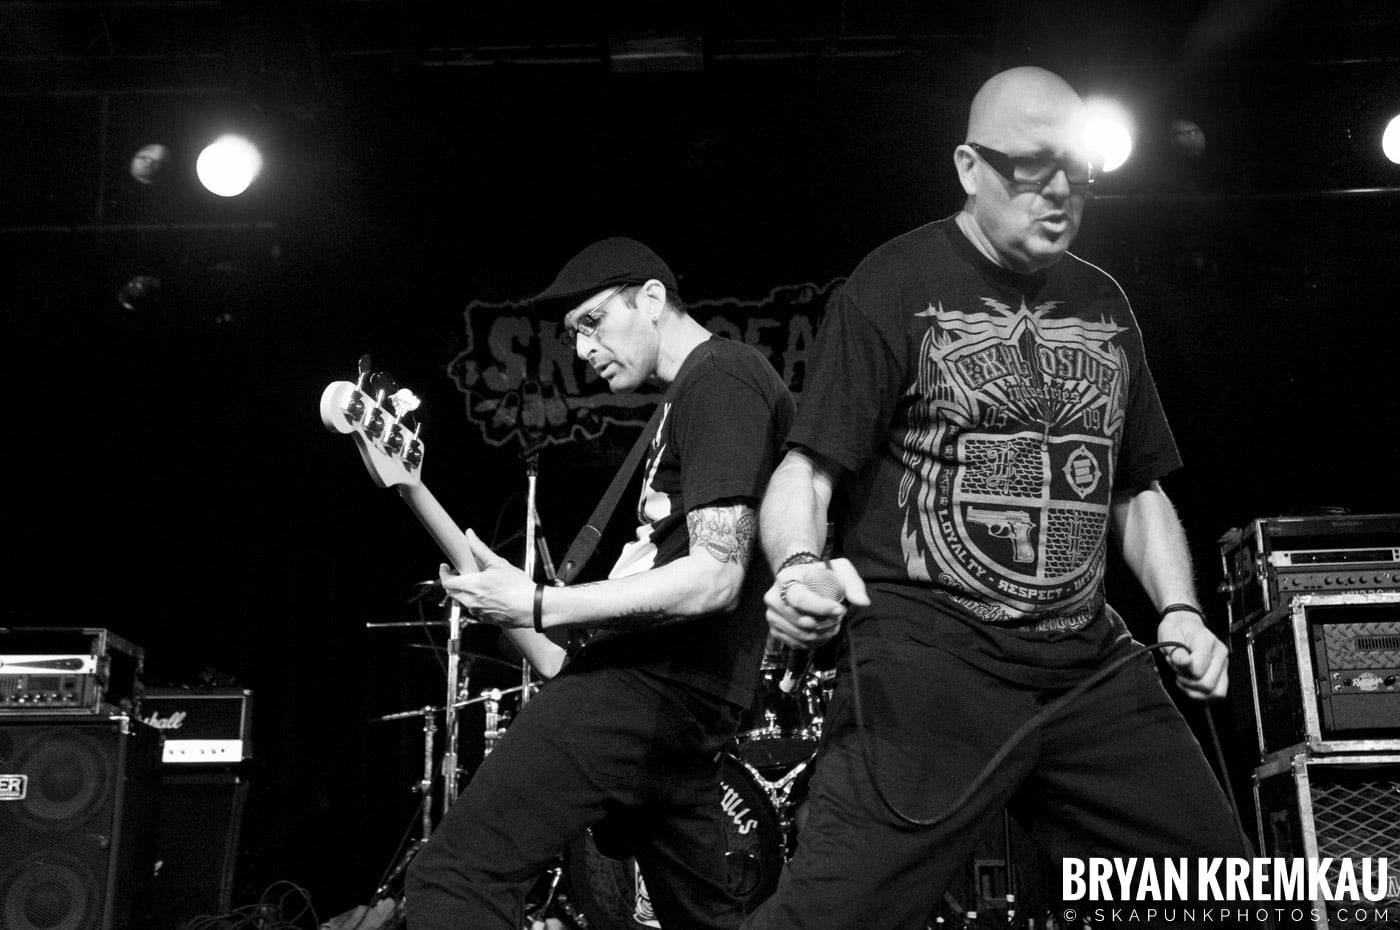 Voodoo Glow Skulls (Ska is Dead Tour) @ Starland Ballroom, Sayreville, NJ - 11.15.09 (12)